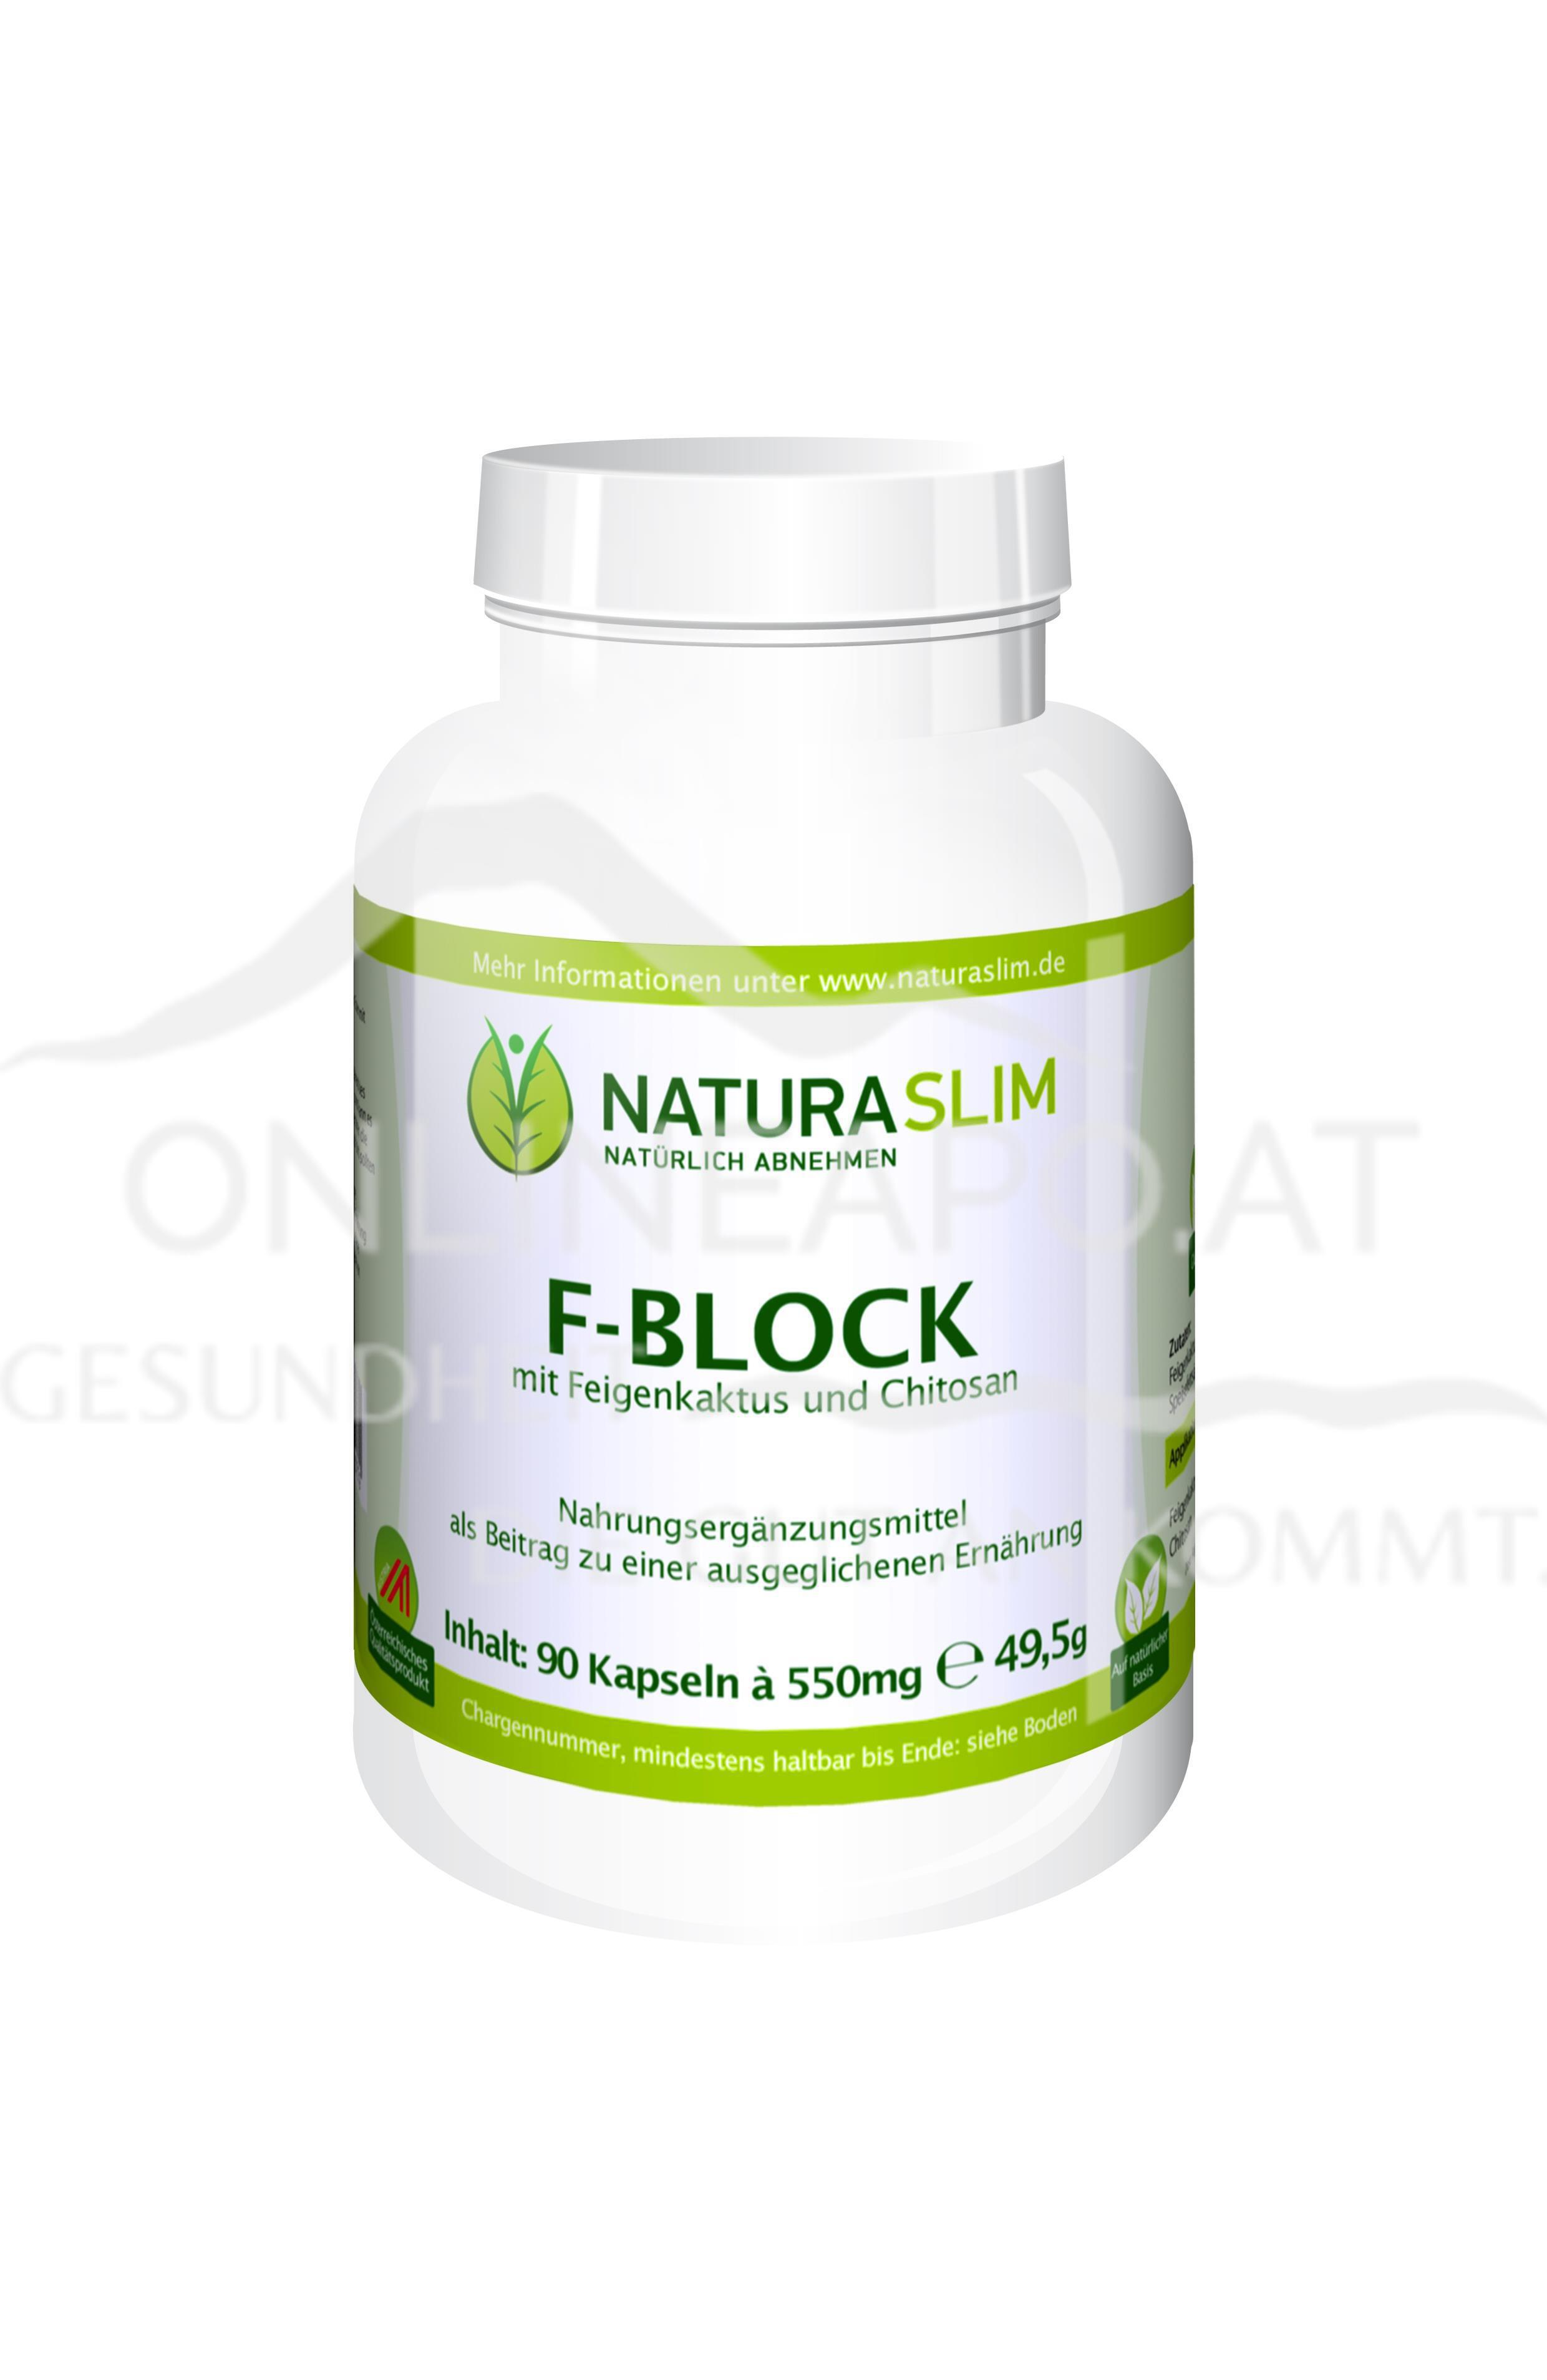 NaturaslimF-Block